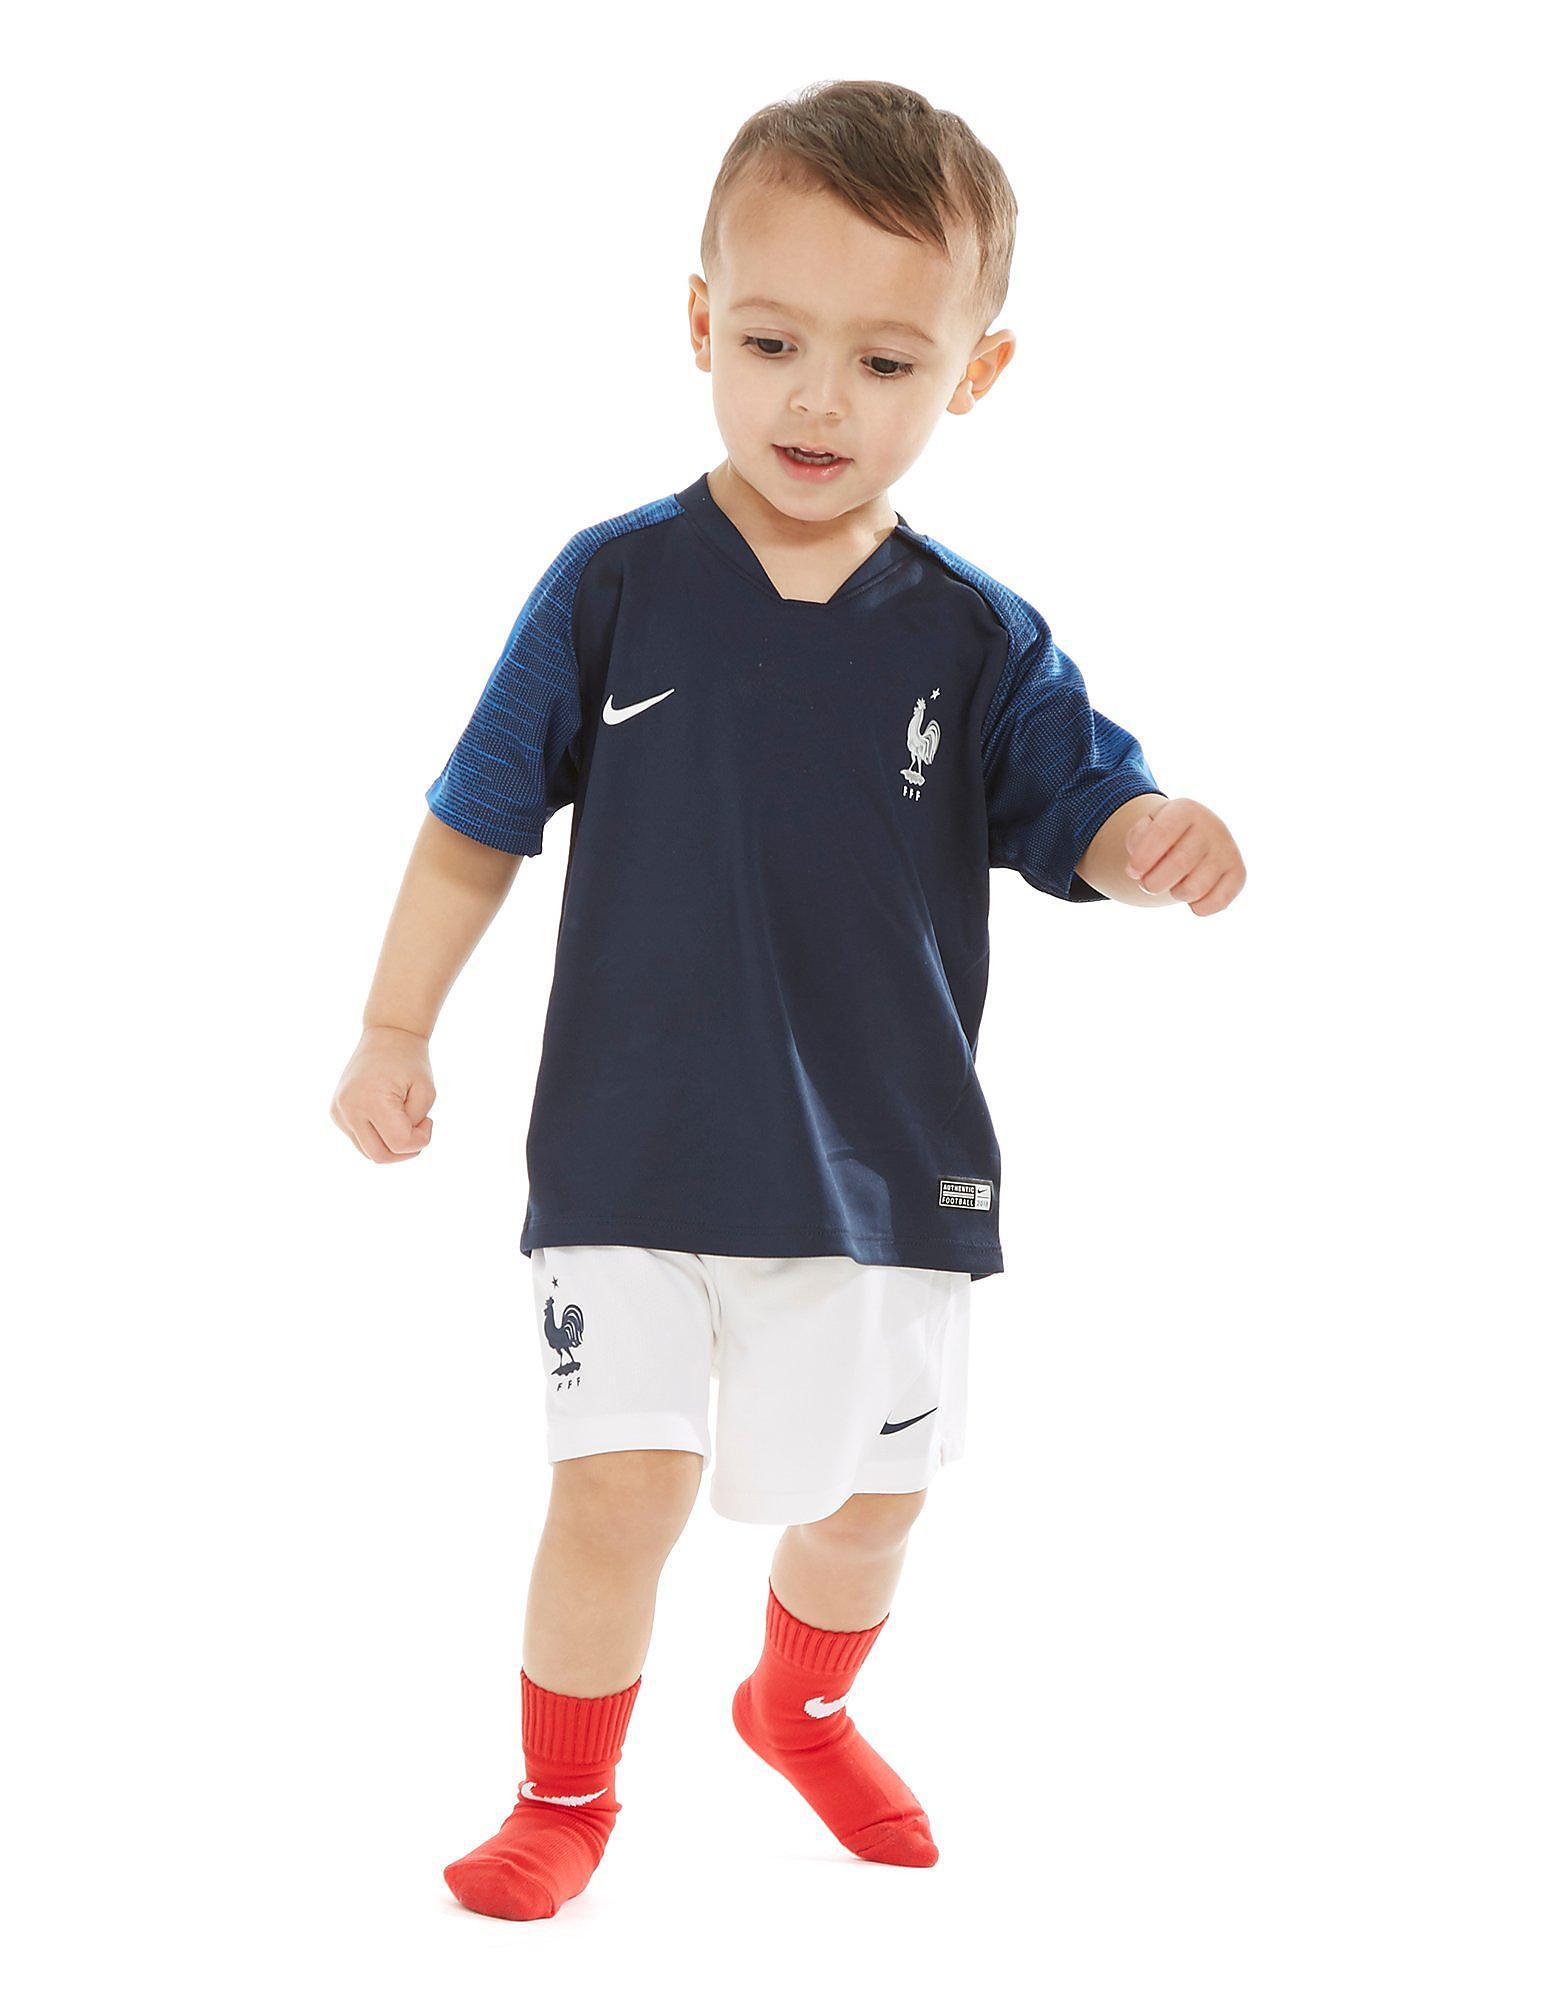 Nike France 2018 Home Kit Baby's